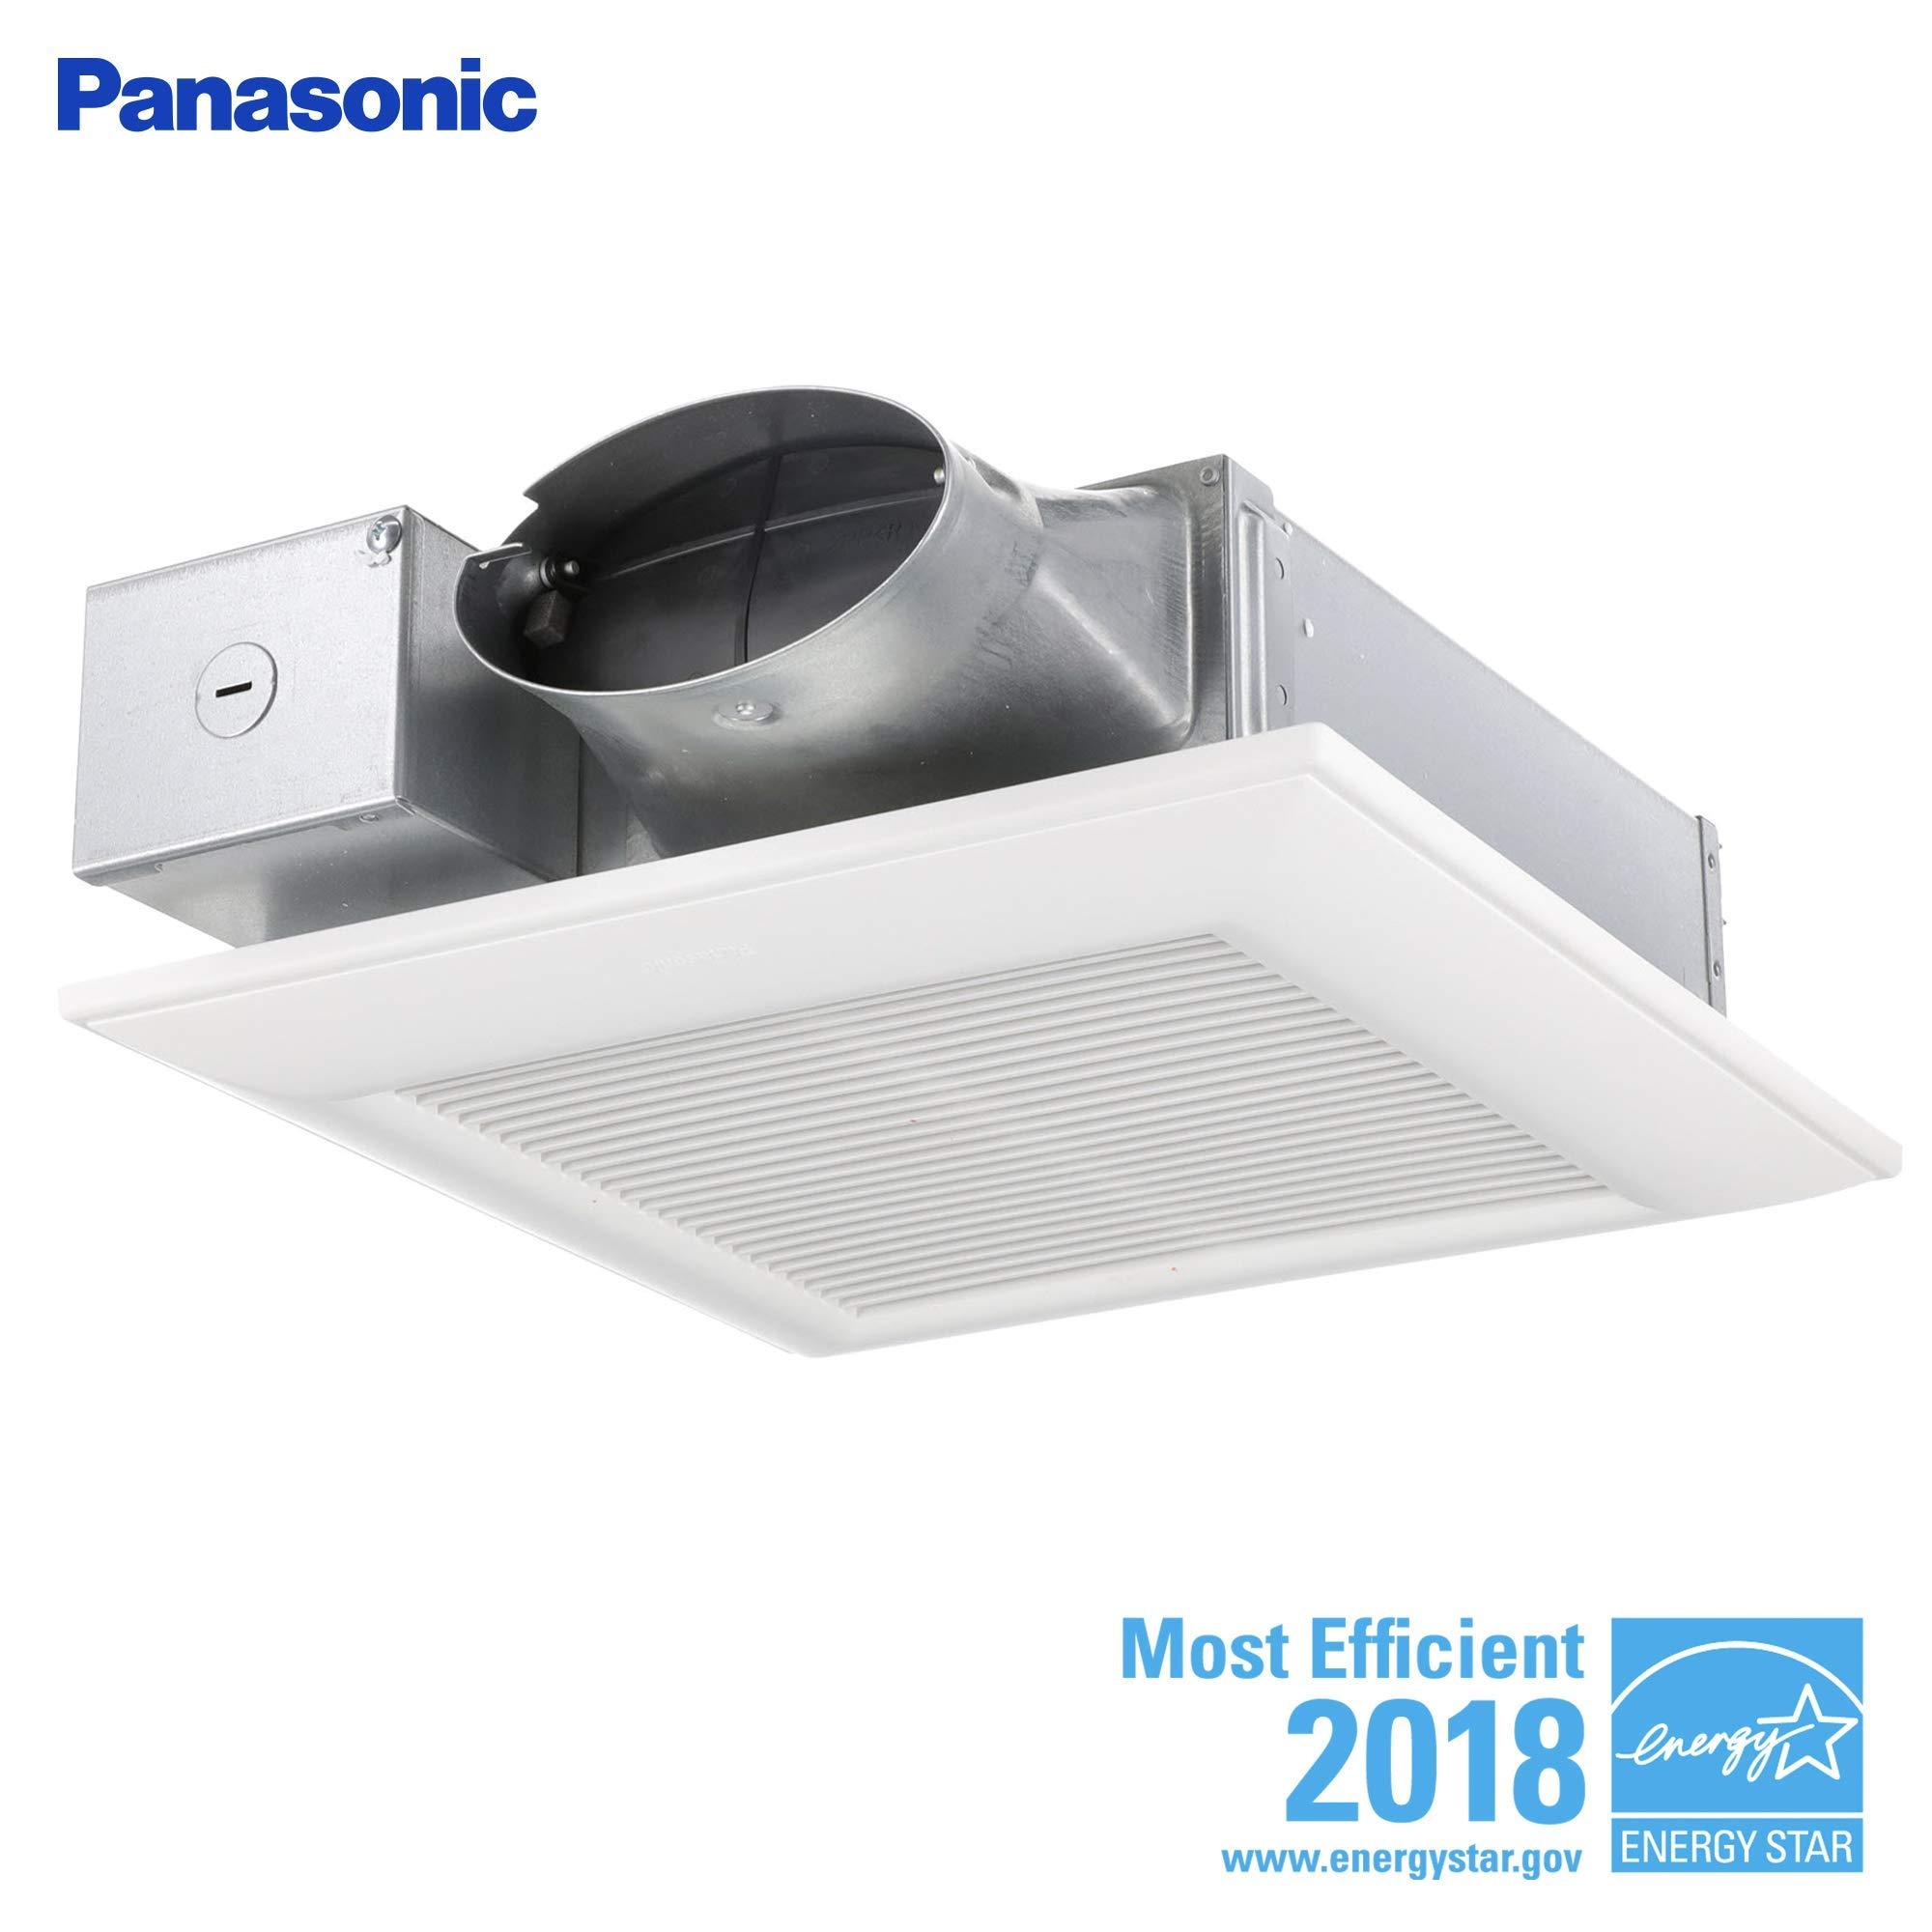 Panasonic FV-0510VS1 WhisperValue DC fan (Renewed)